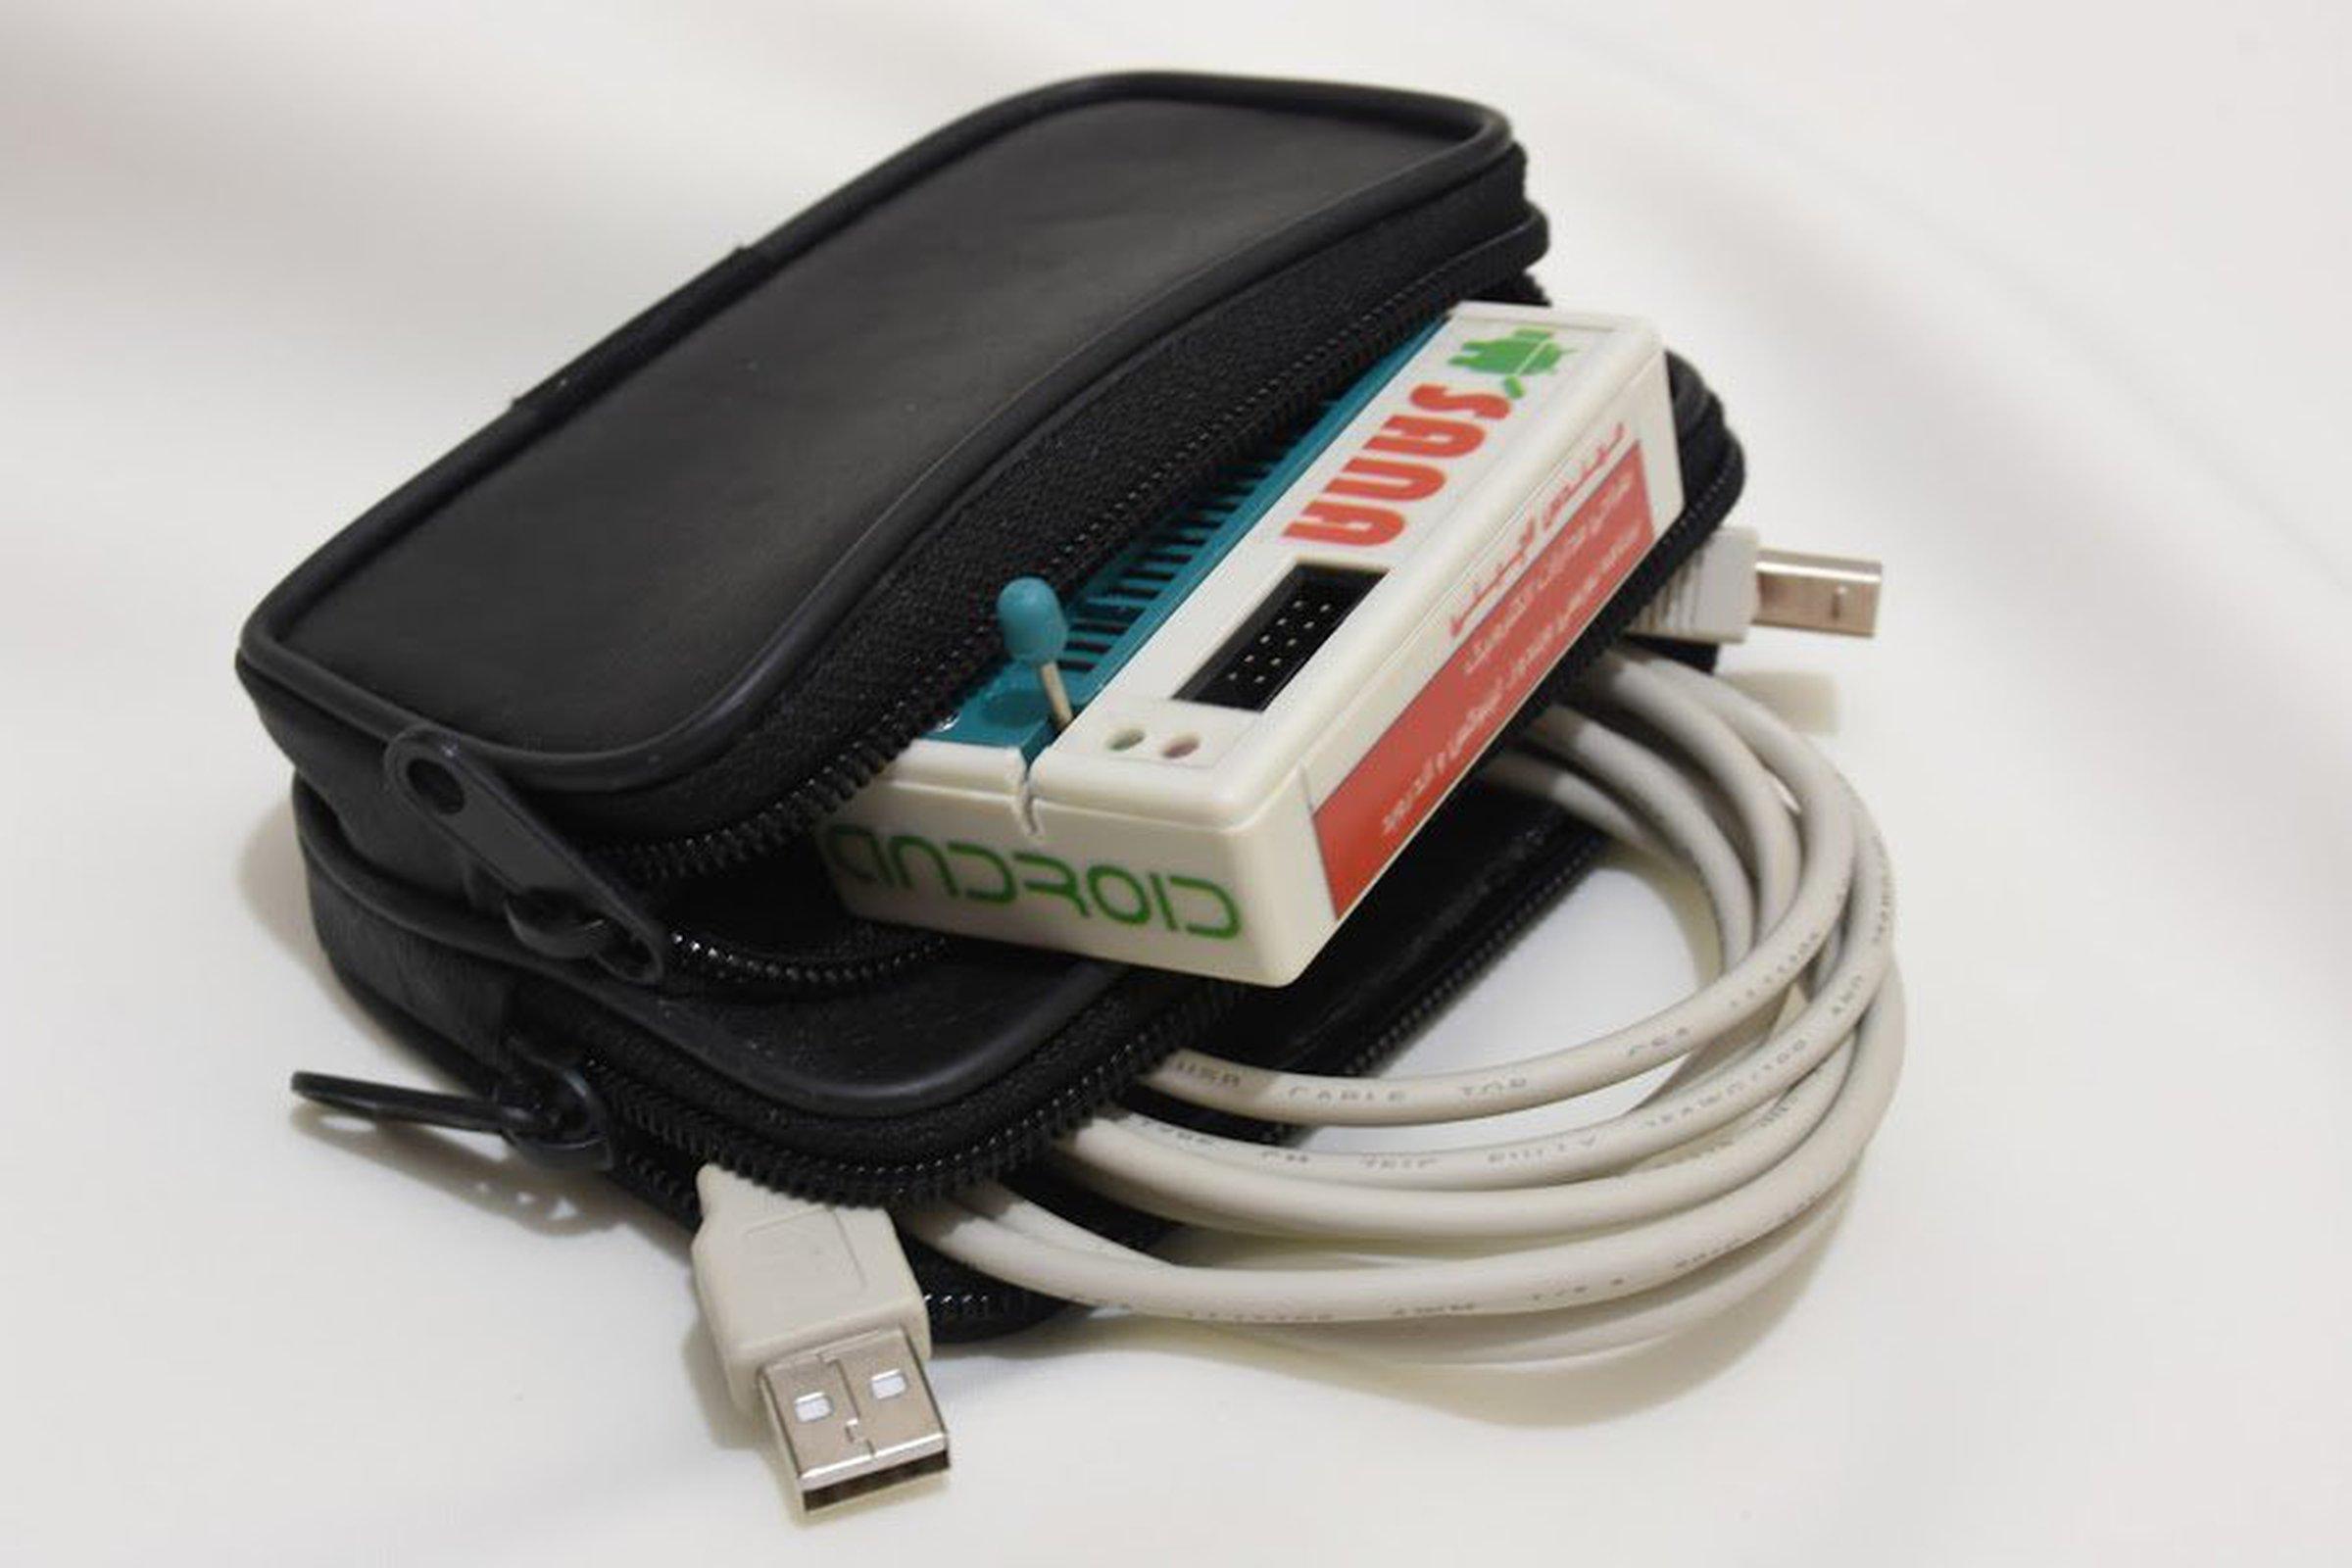 Sana Ic Tester Usbasp Programmeravr 2493cxx From Hossein Lachini Atmel Usb Programmer Circuit Zif Socket Atmega8 2 4